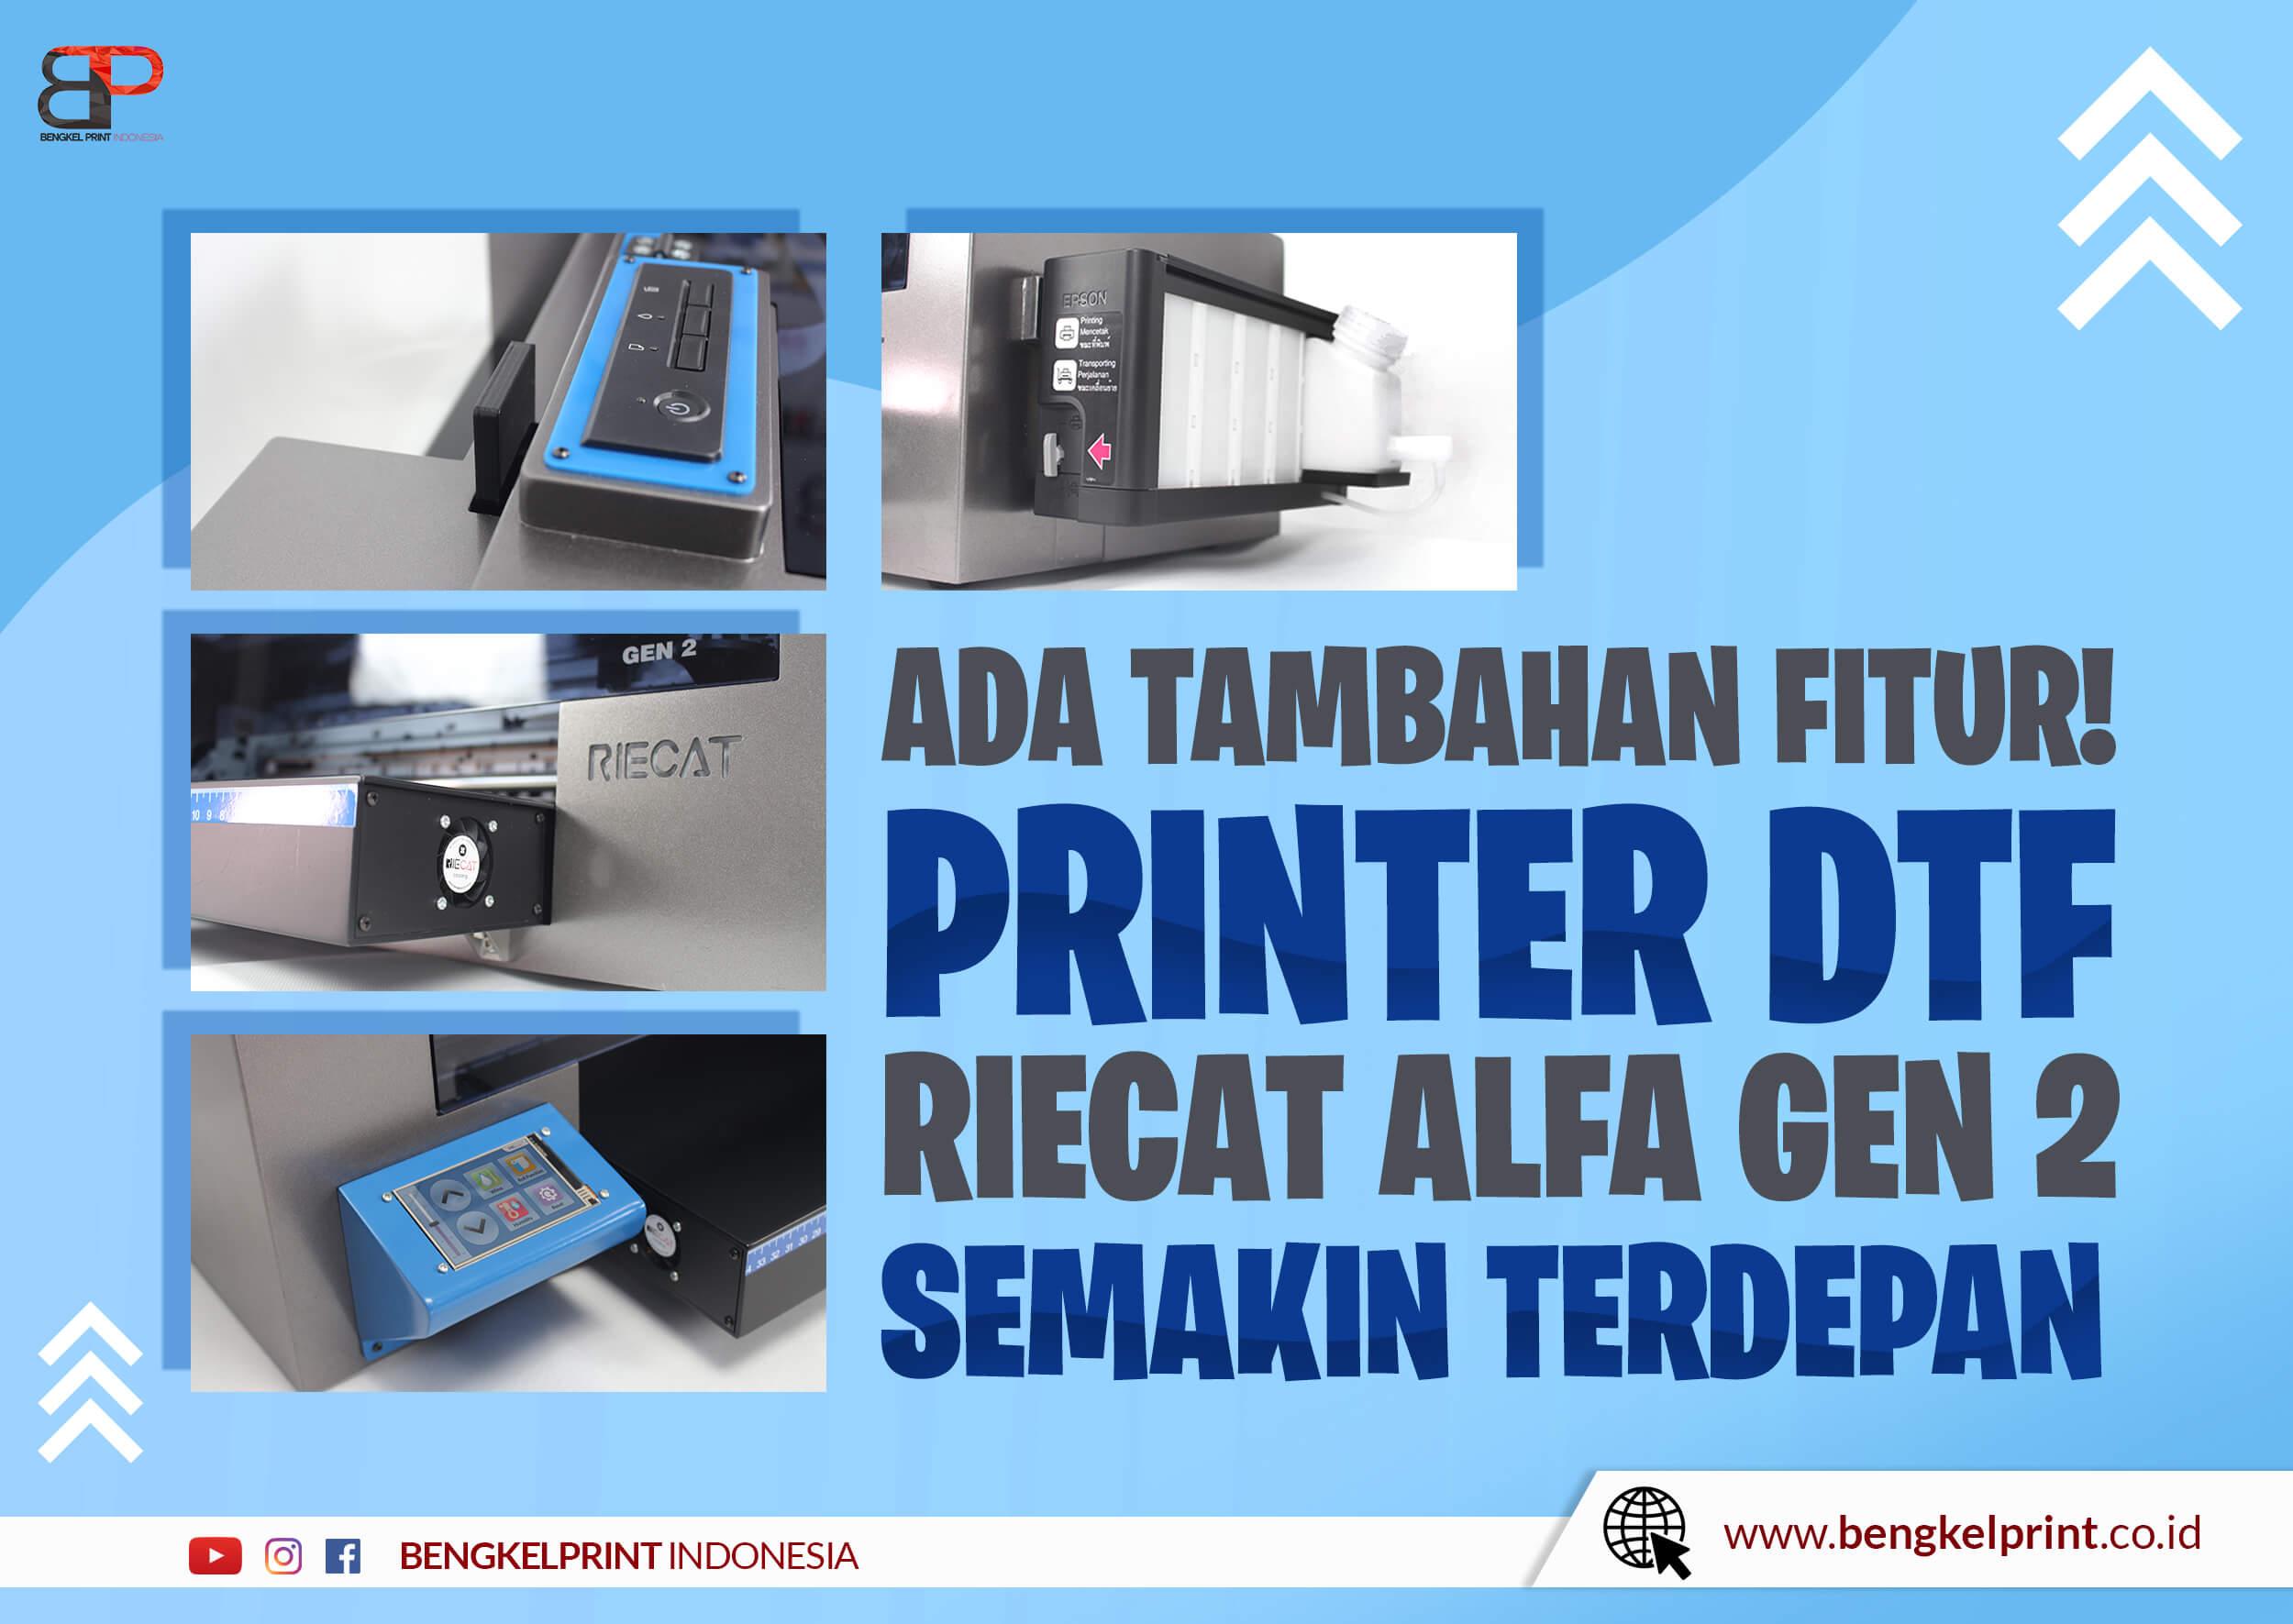 Jual Printer Riecat Alfa Gen 2